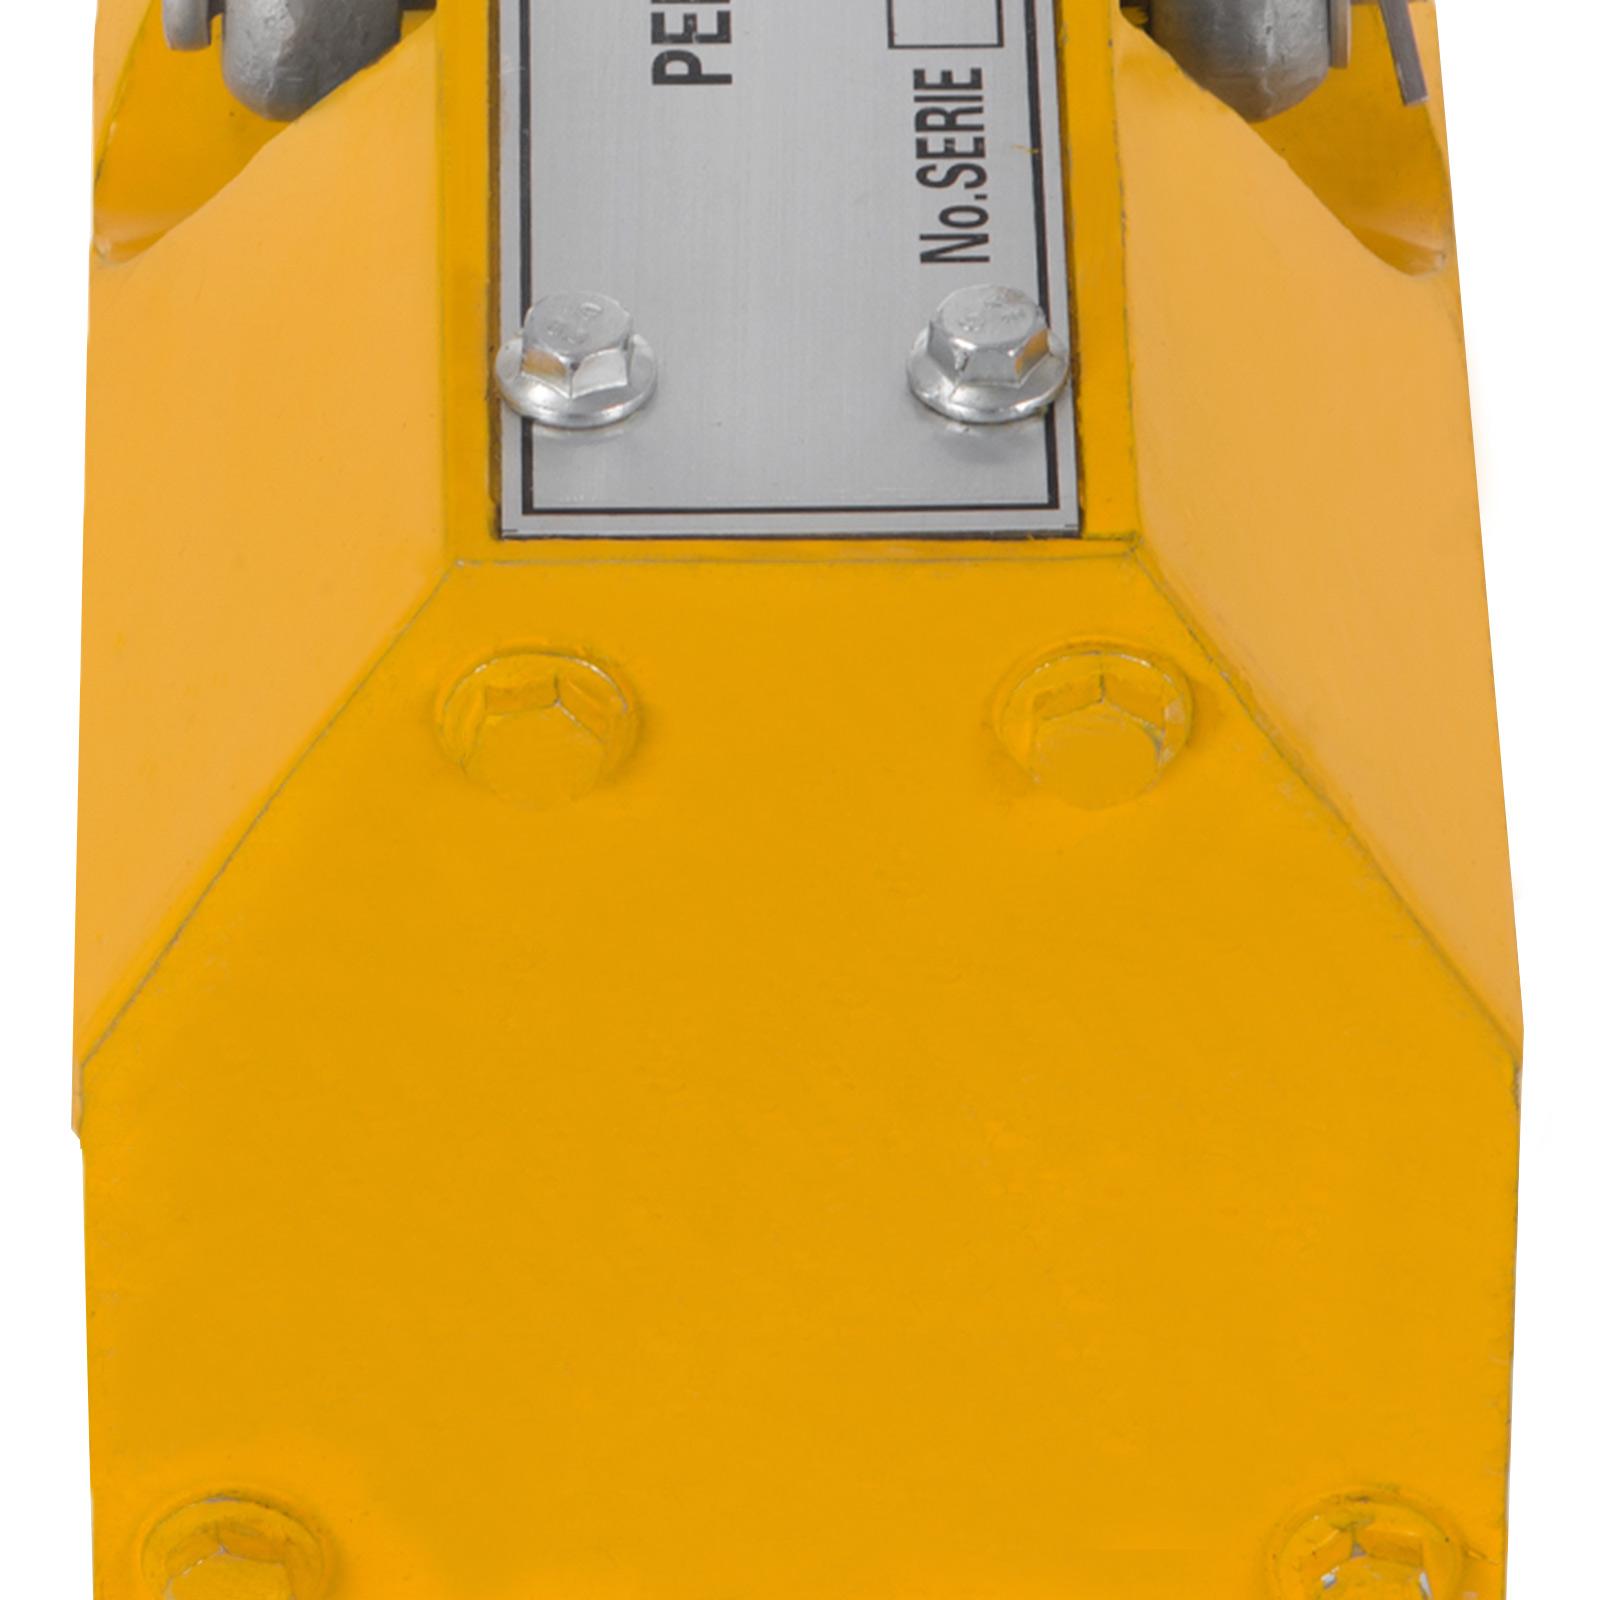 100-300-600-1000KG-Steel-Magnetic-Lifter-Heavy-Duty-Crane-Hoist-Lifting-Magnet miniature 96